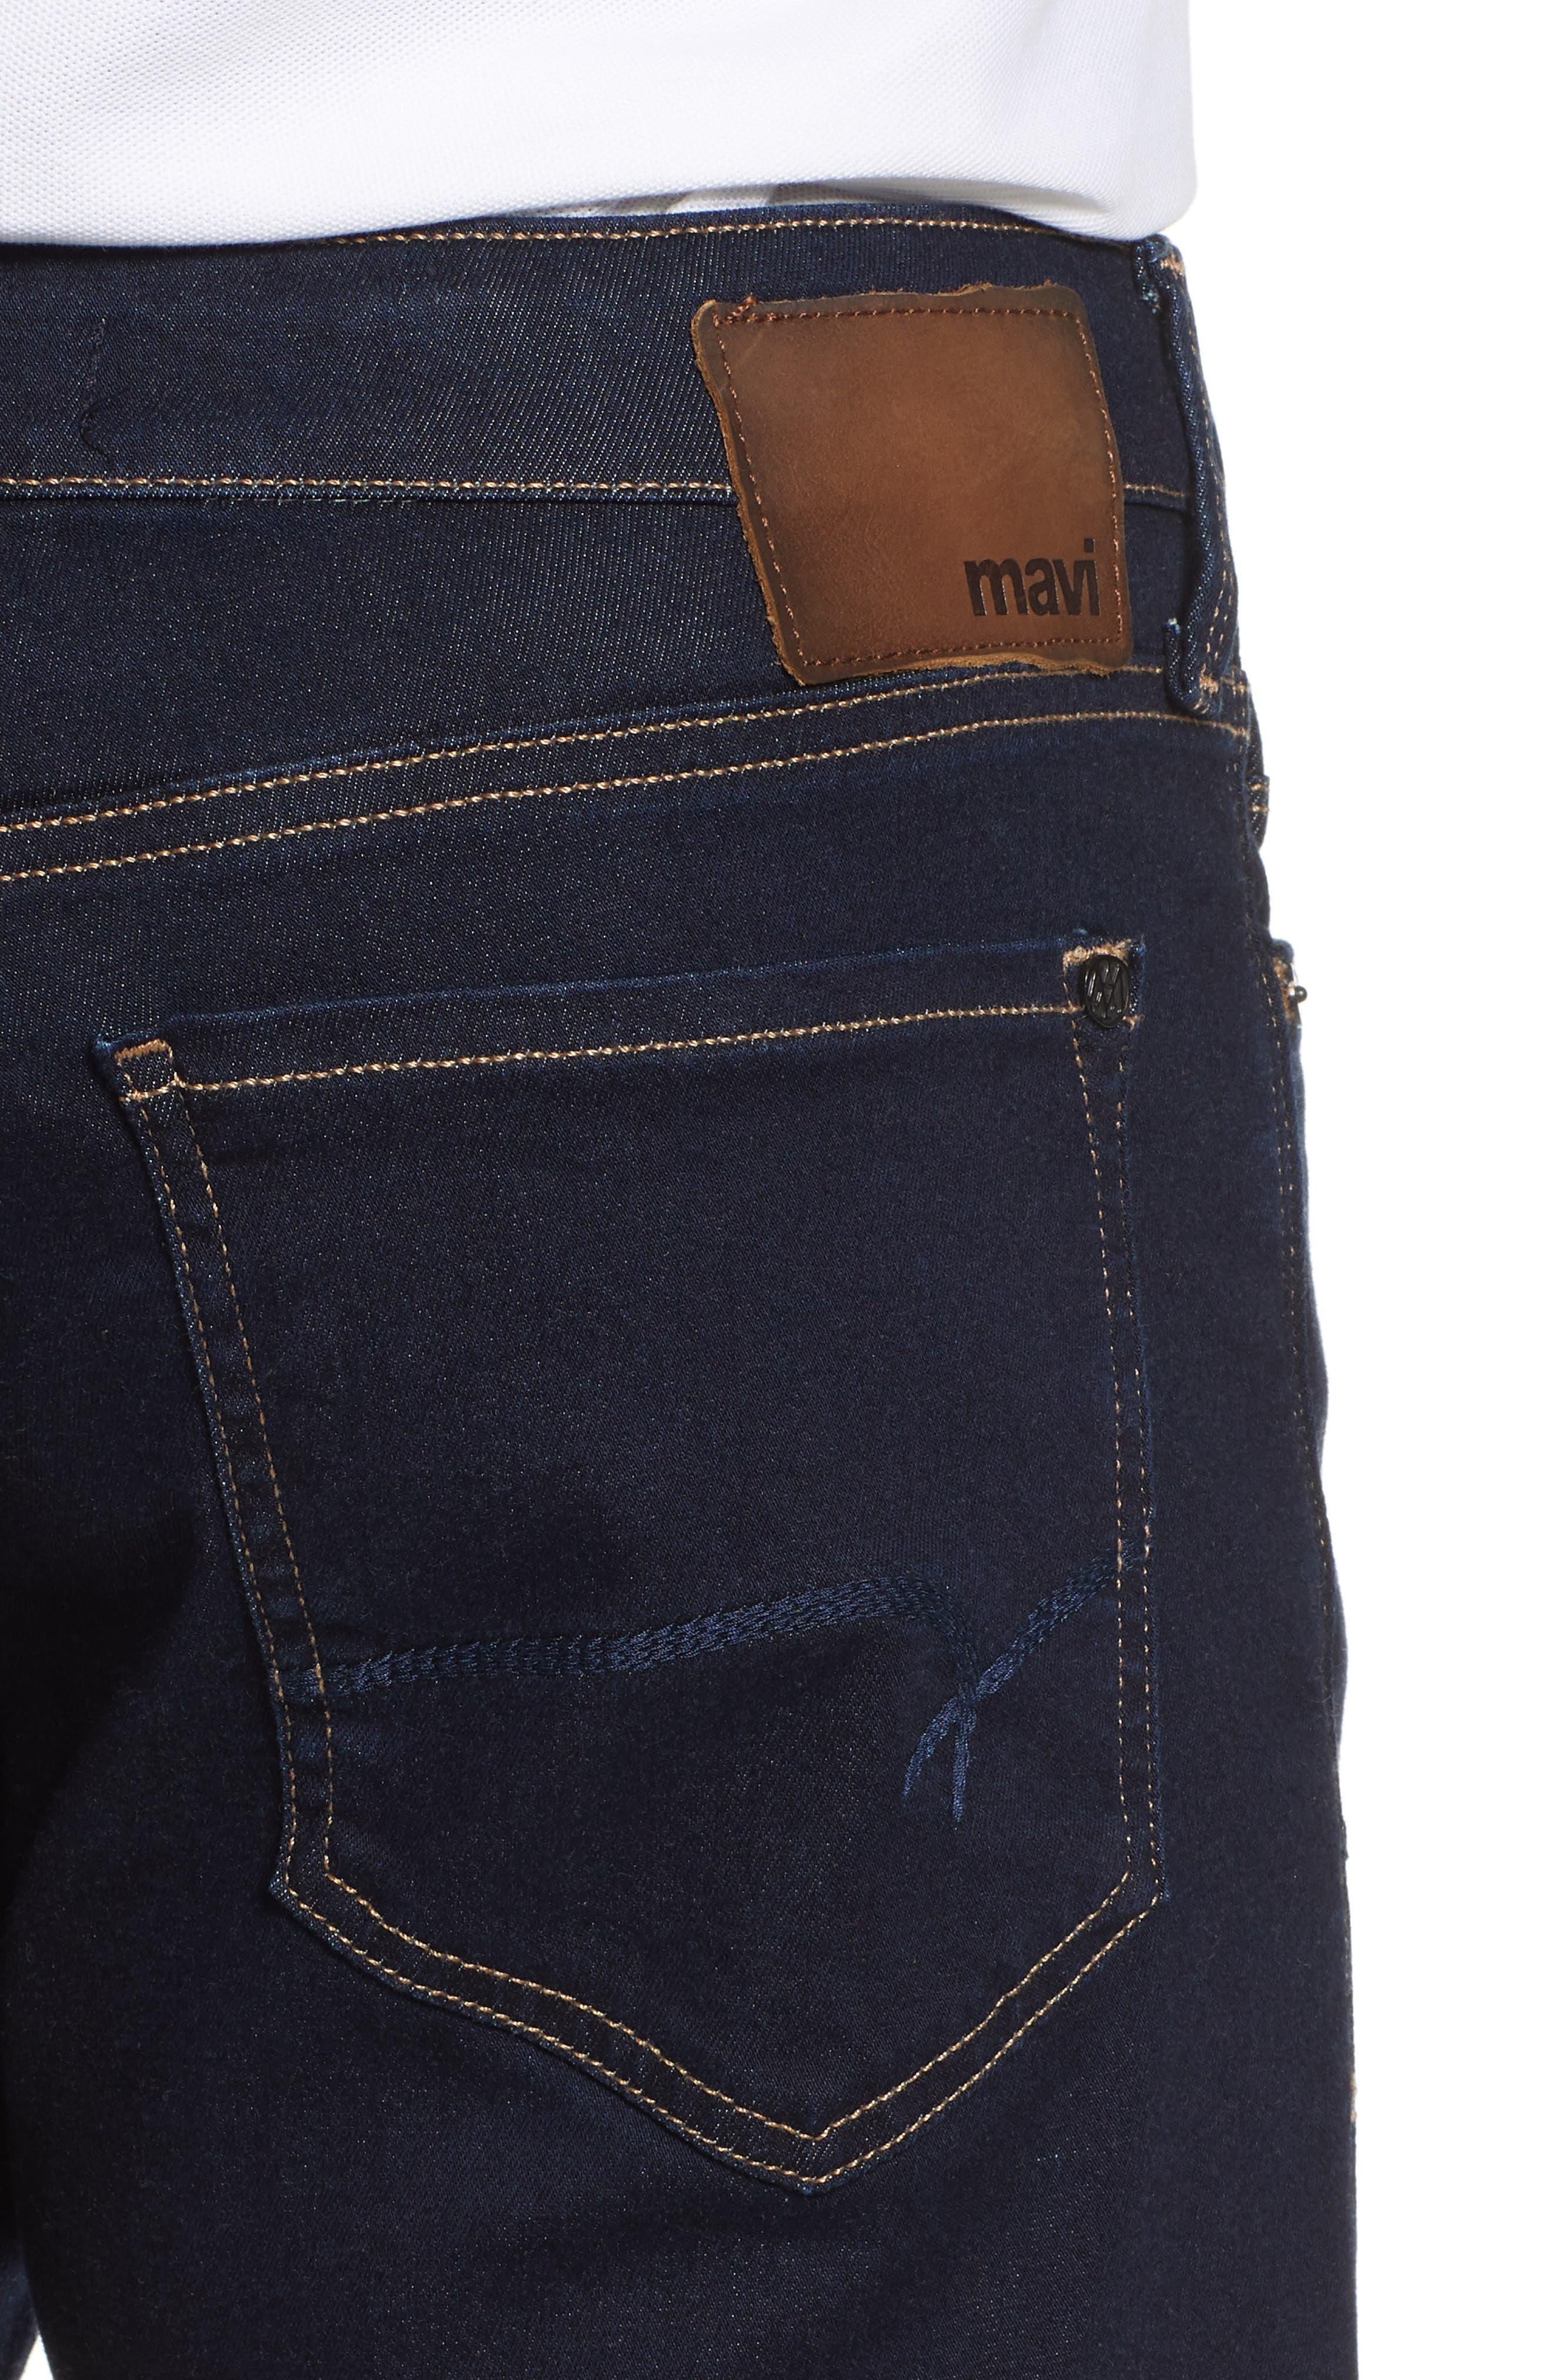 Matt Relaxed Fit Straight Leg Jeans,                             Alternate thumbnail 4, color,                             DEEP RINSE SOFT MOVE